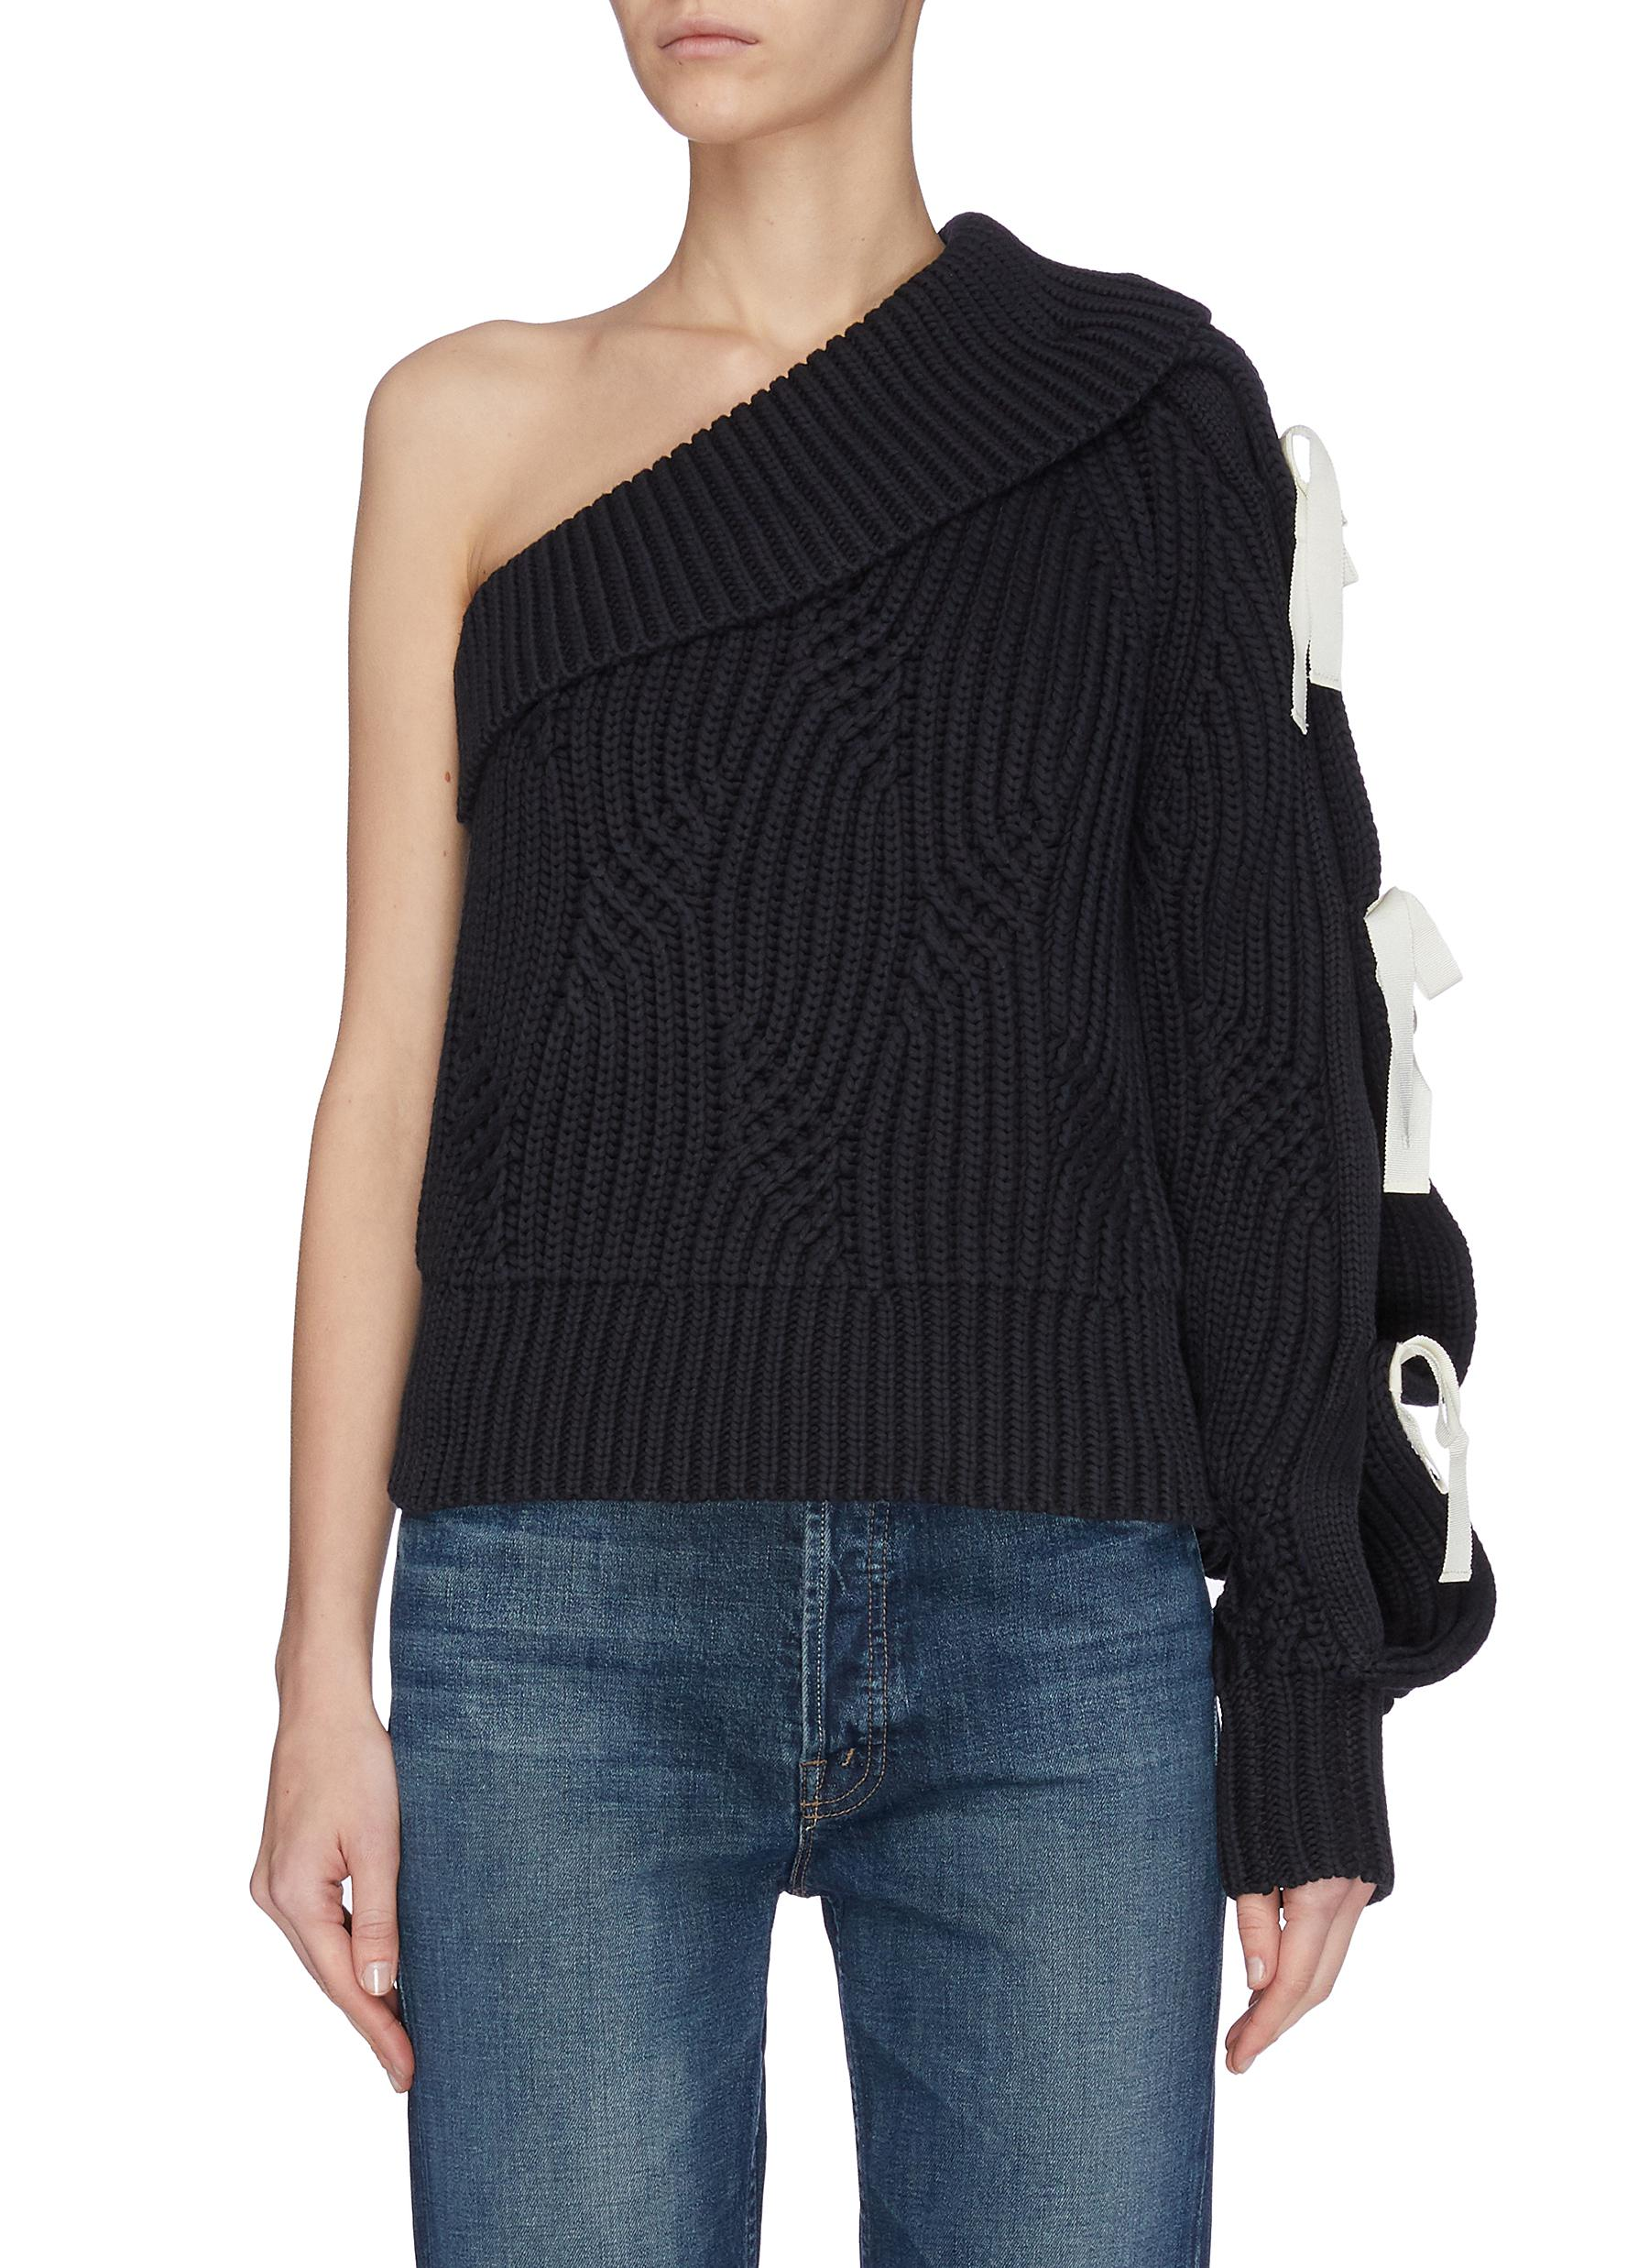 Buy Hellessy Knitwear One shoulder ribbon embellished rib knit sweater